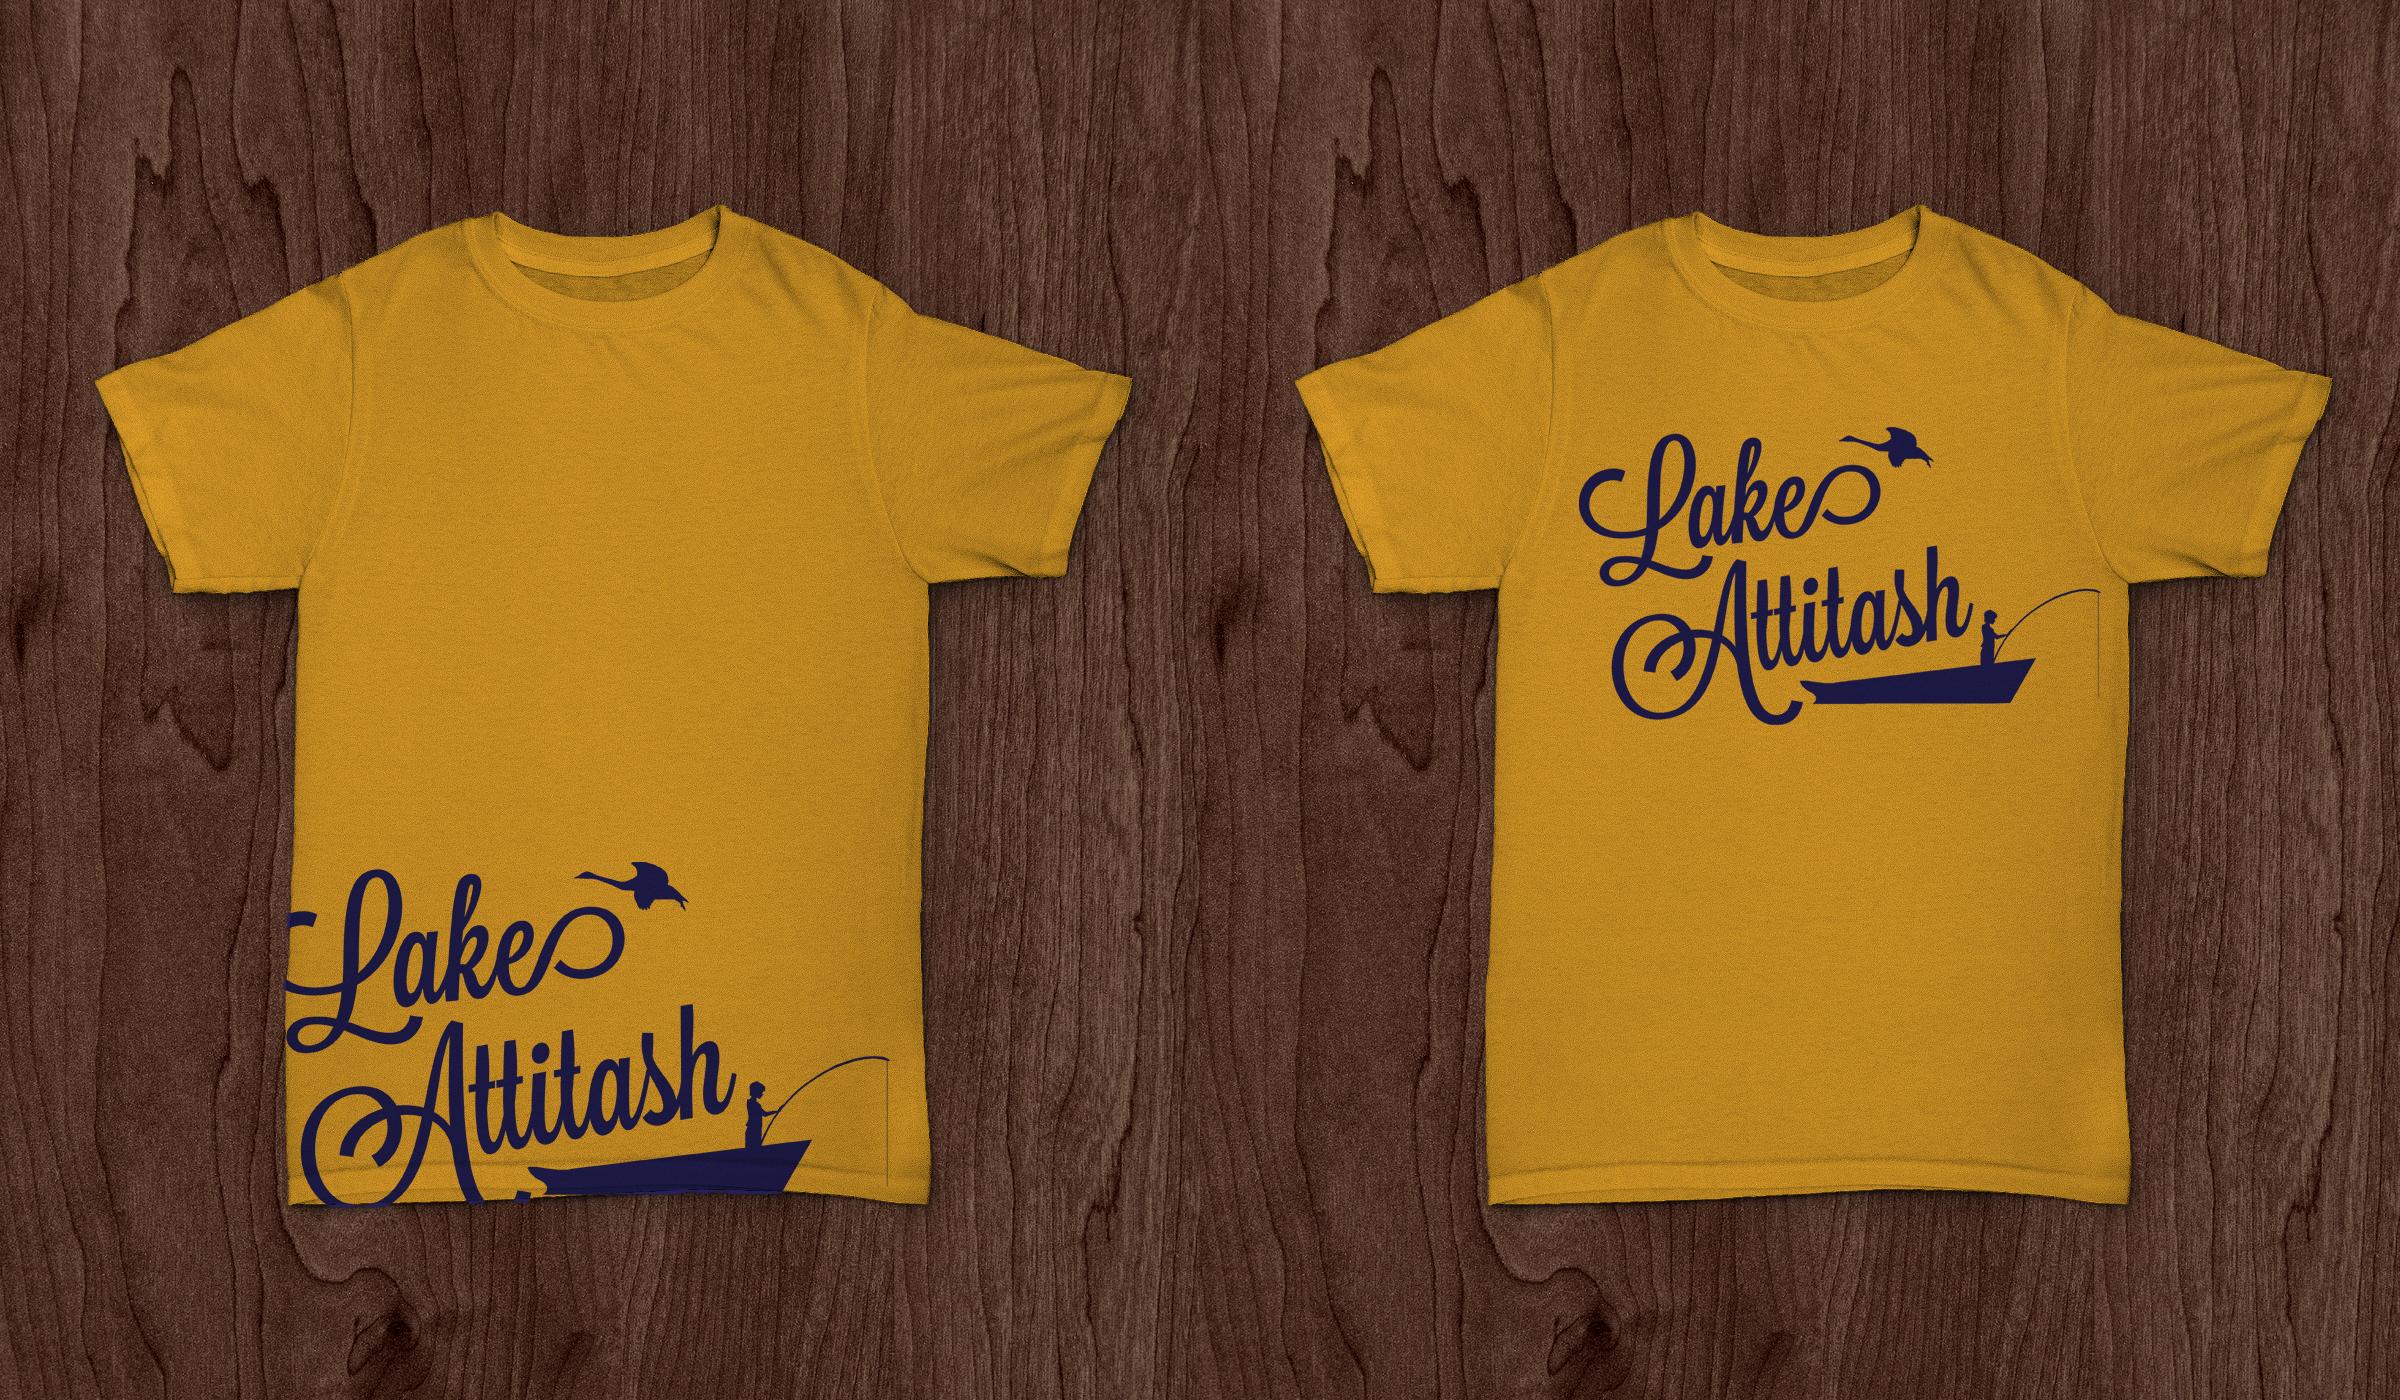 Shirt design ink - Shirt Design Ink 67